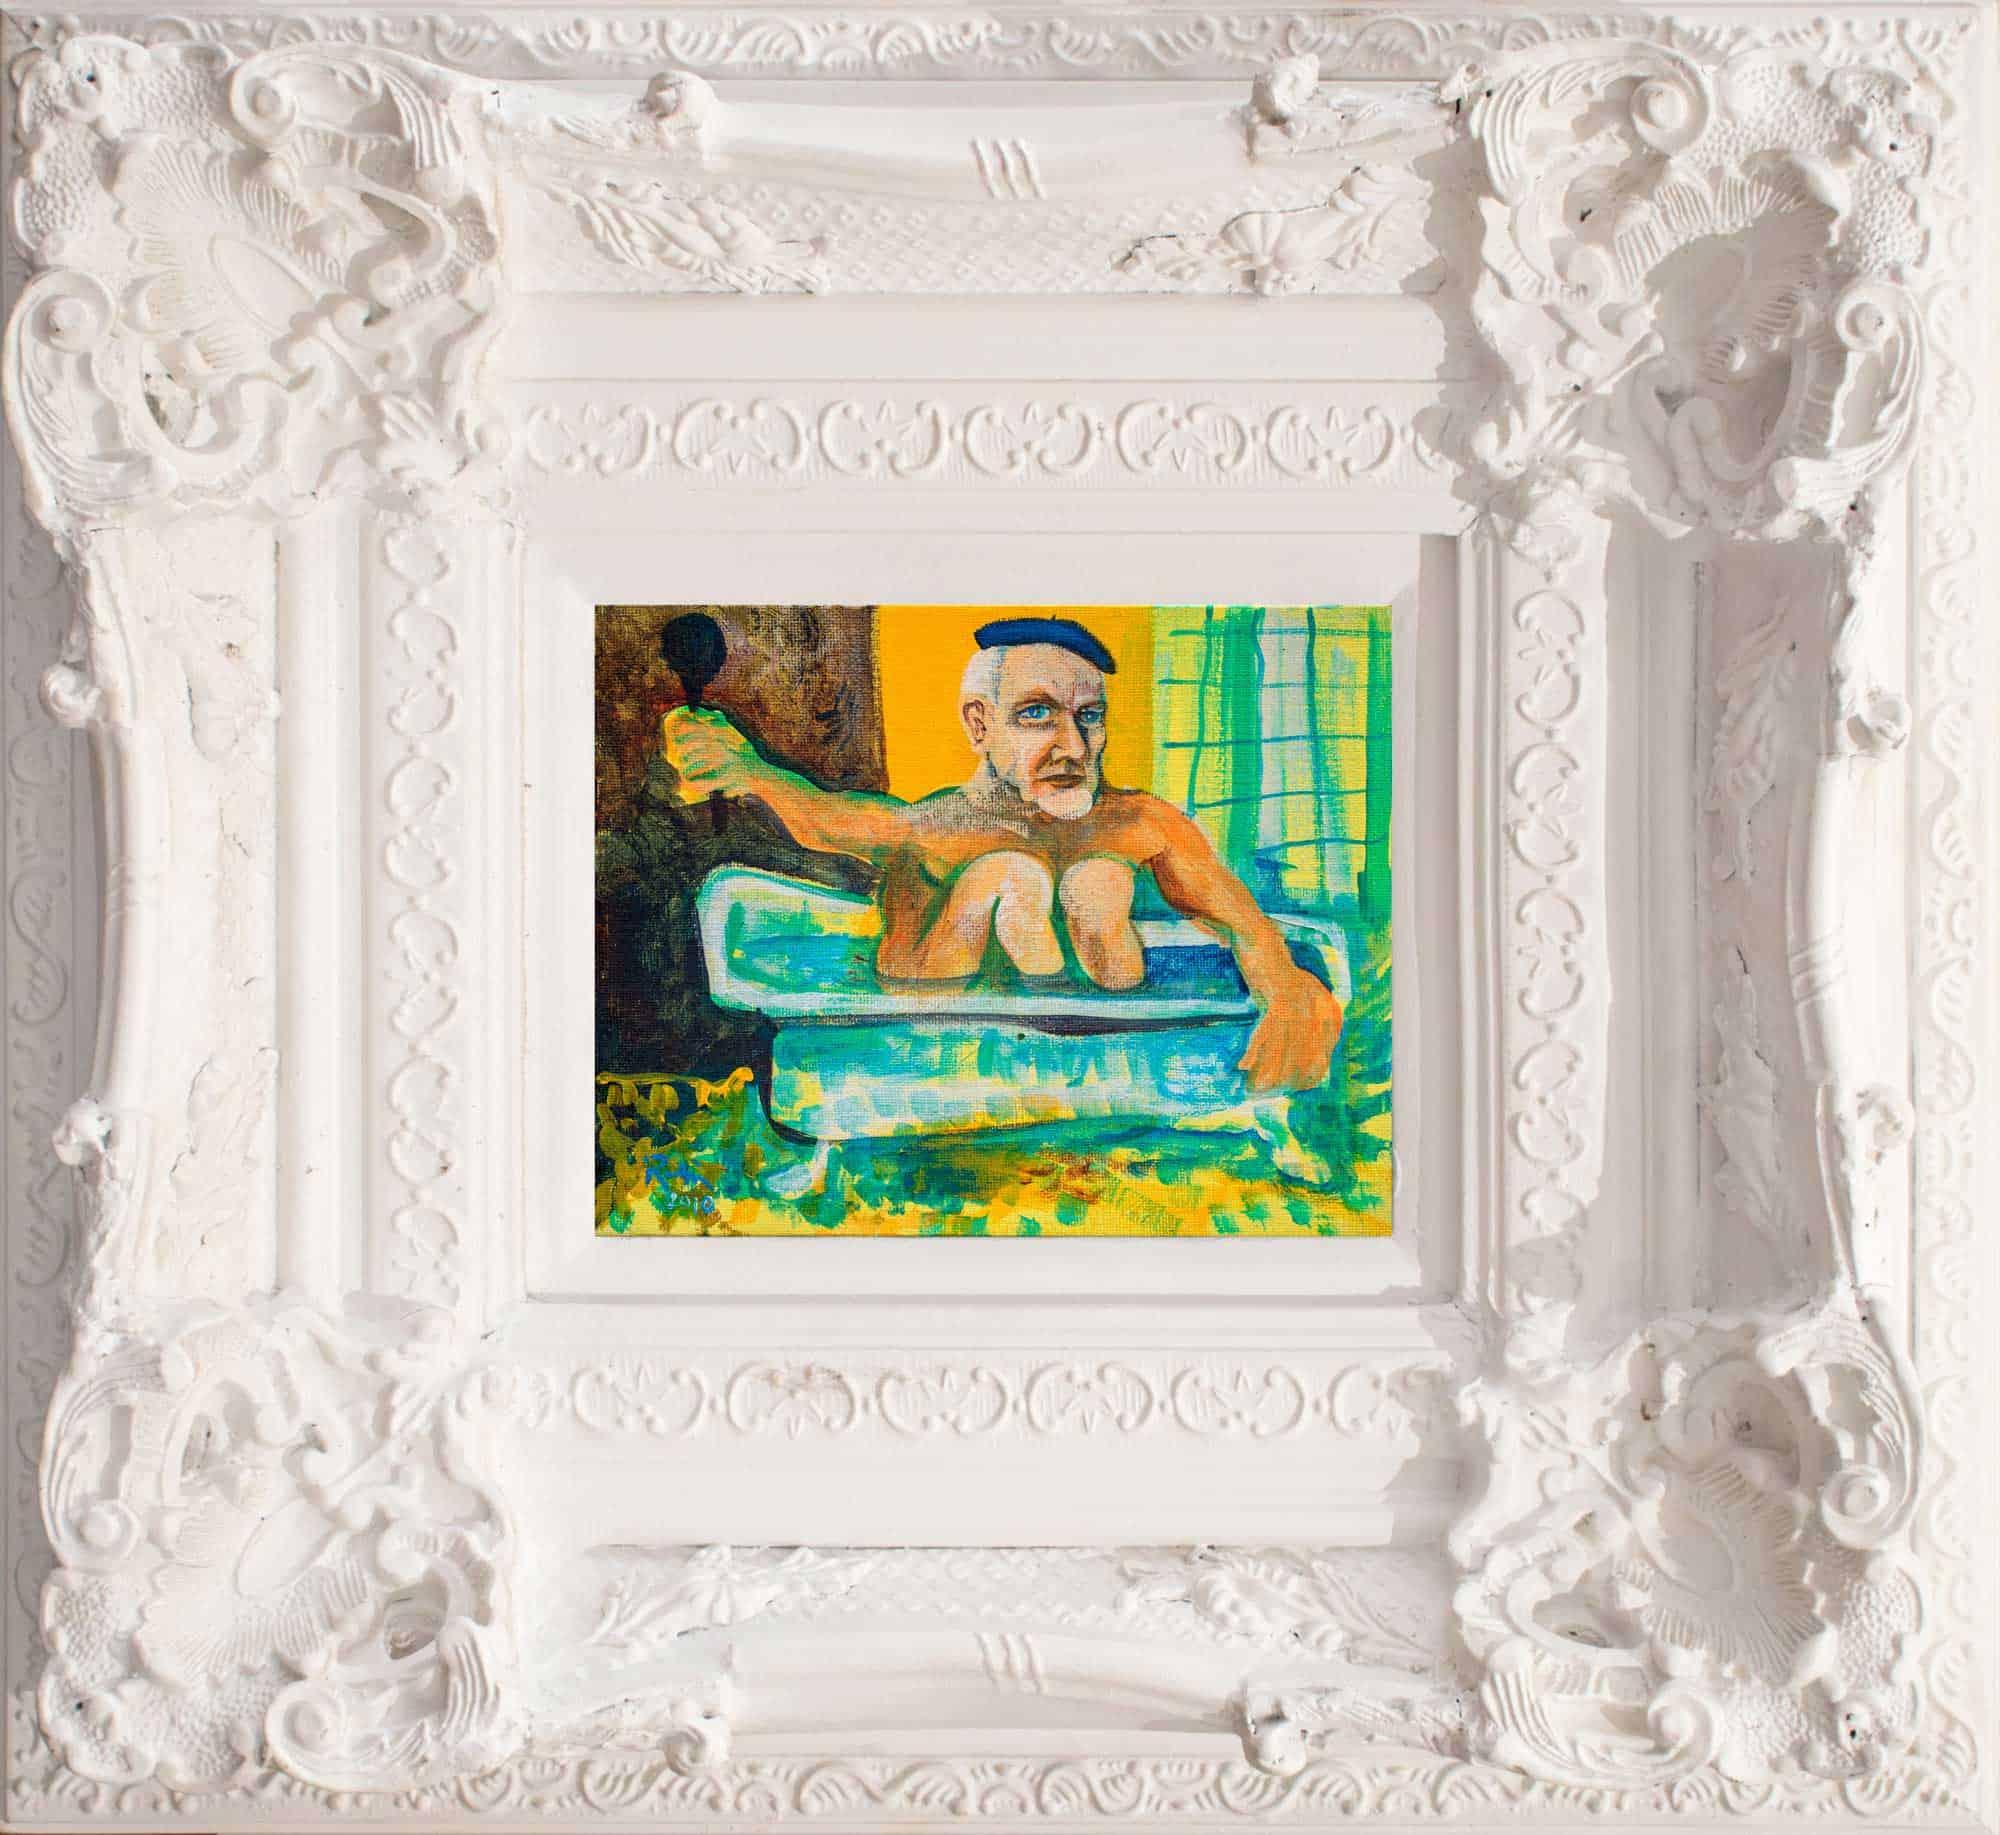 Victor Rubin - Untitled (Olsen in the Bath 1) (2010)